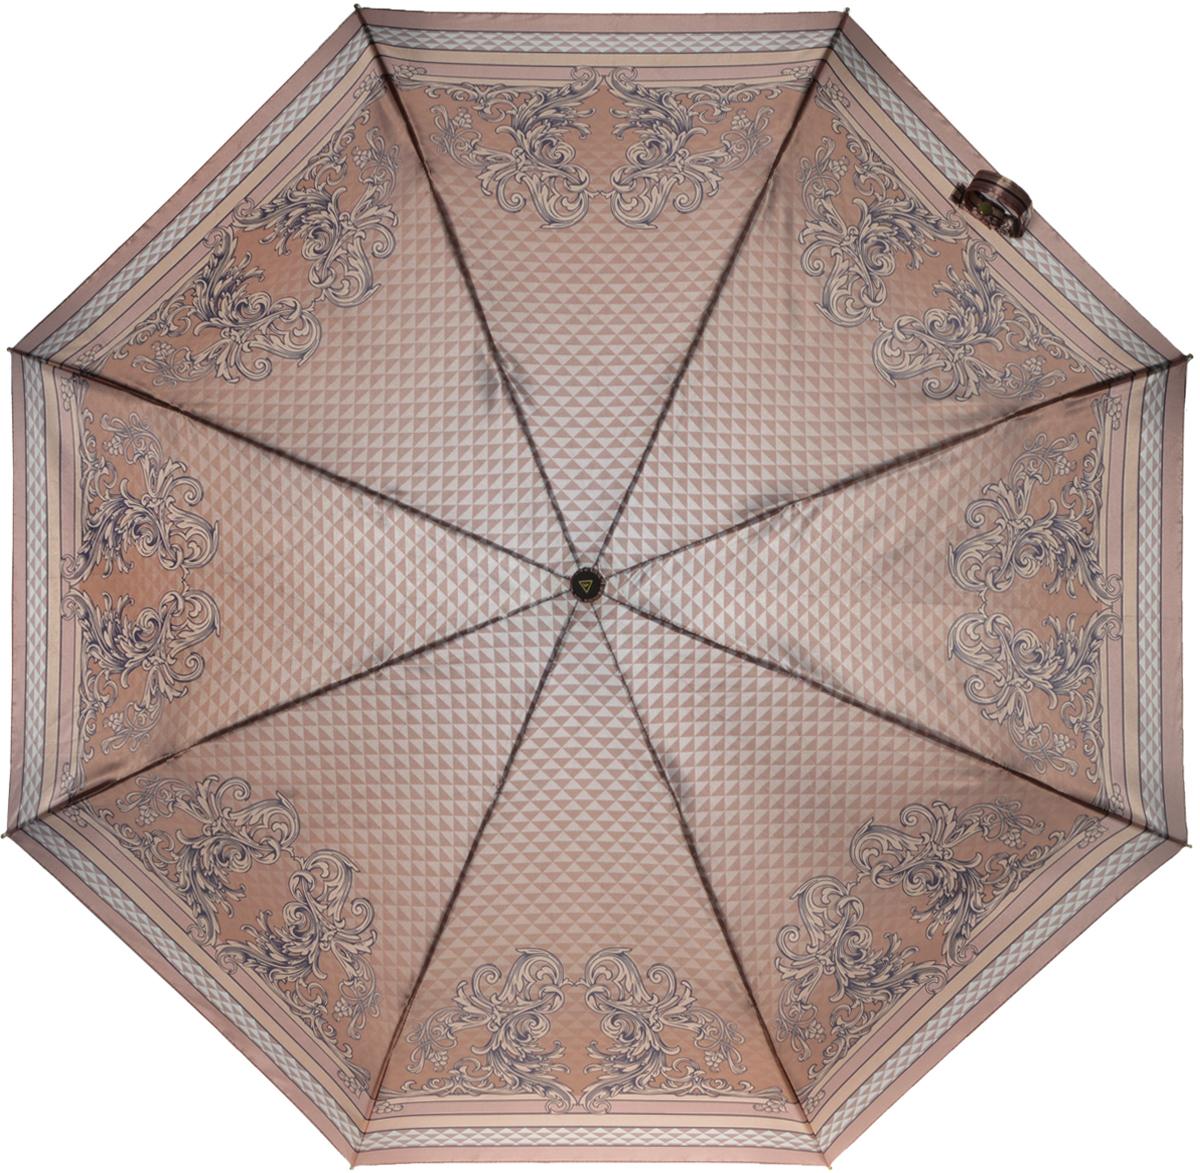 Зонт женский Fabretti, автомат, 3 сложения. L-16107-5L-16107-5Зонт женский Fabretti, облегченный суперавтомат, 3 сложения